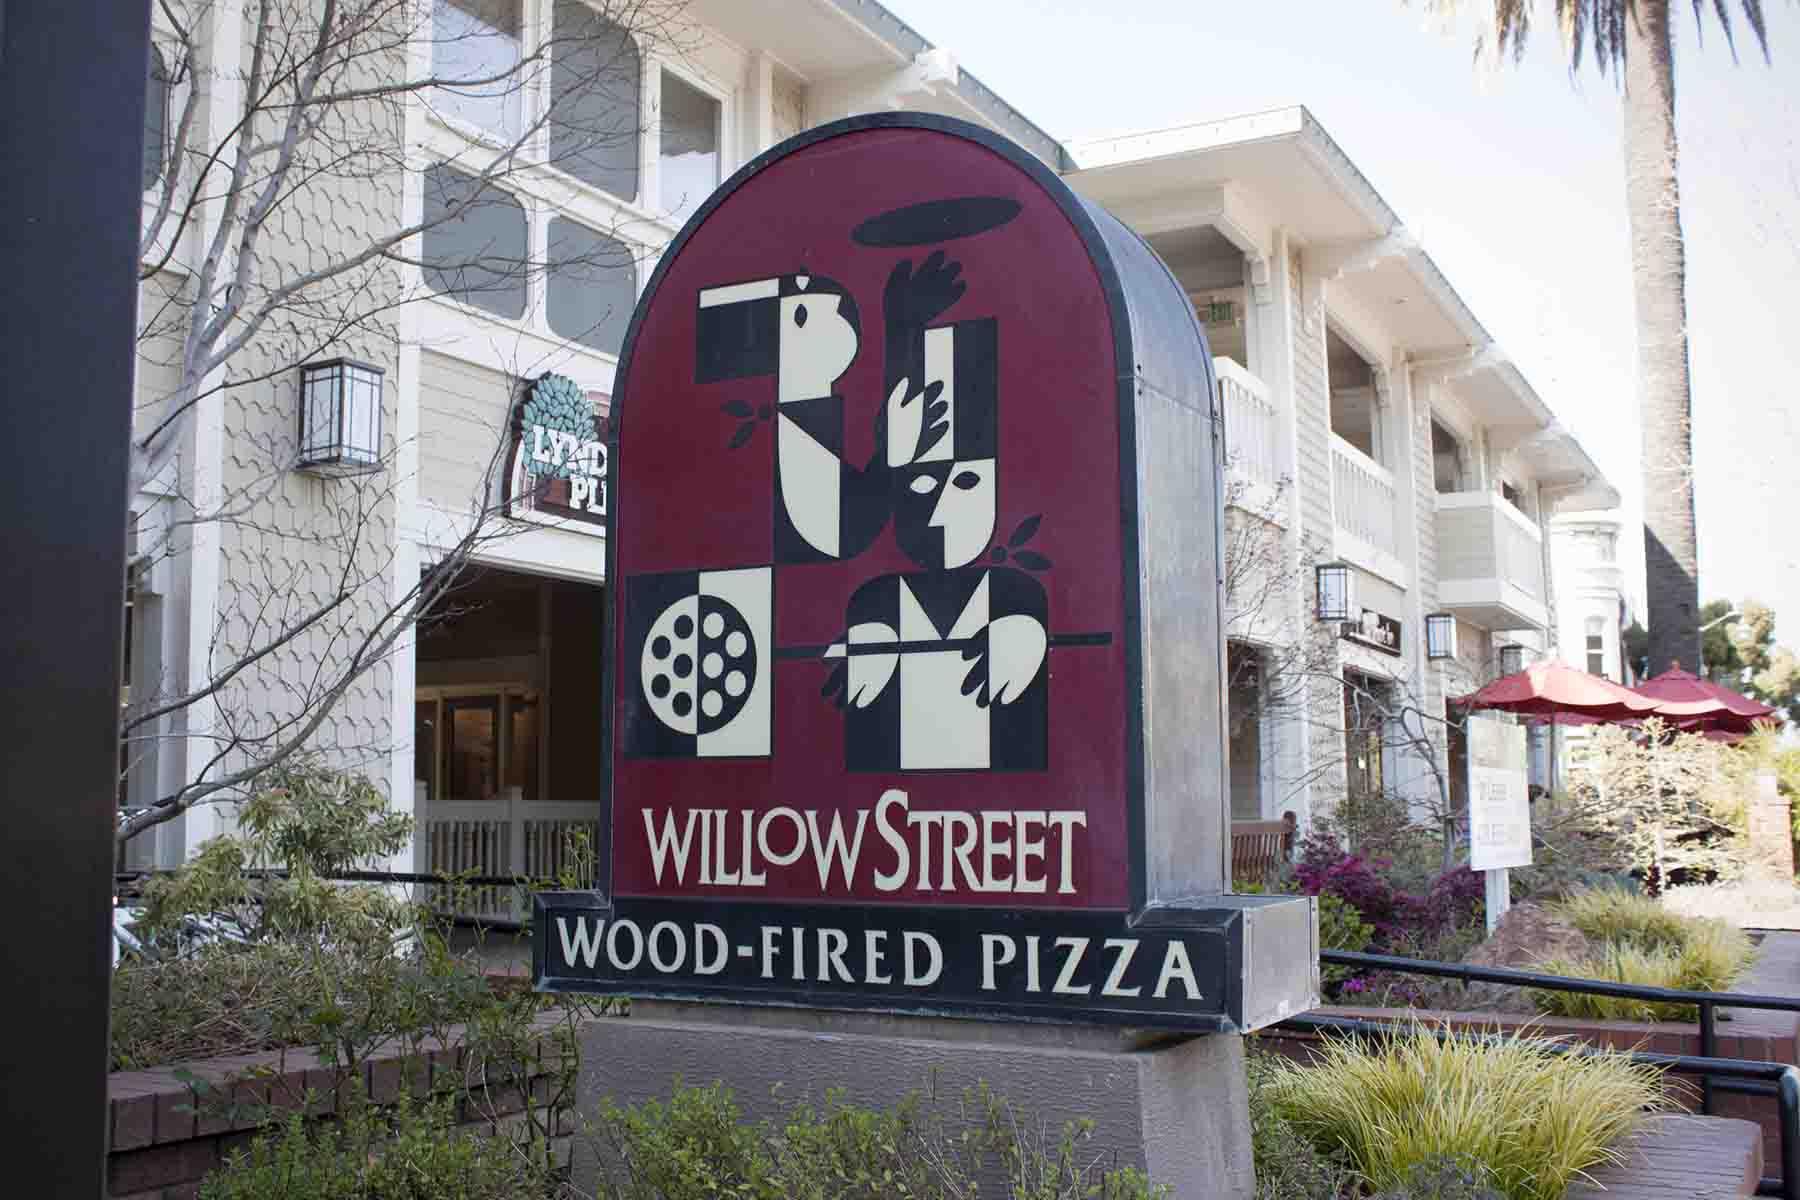 Willow Street